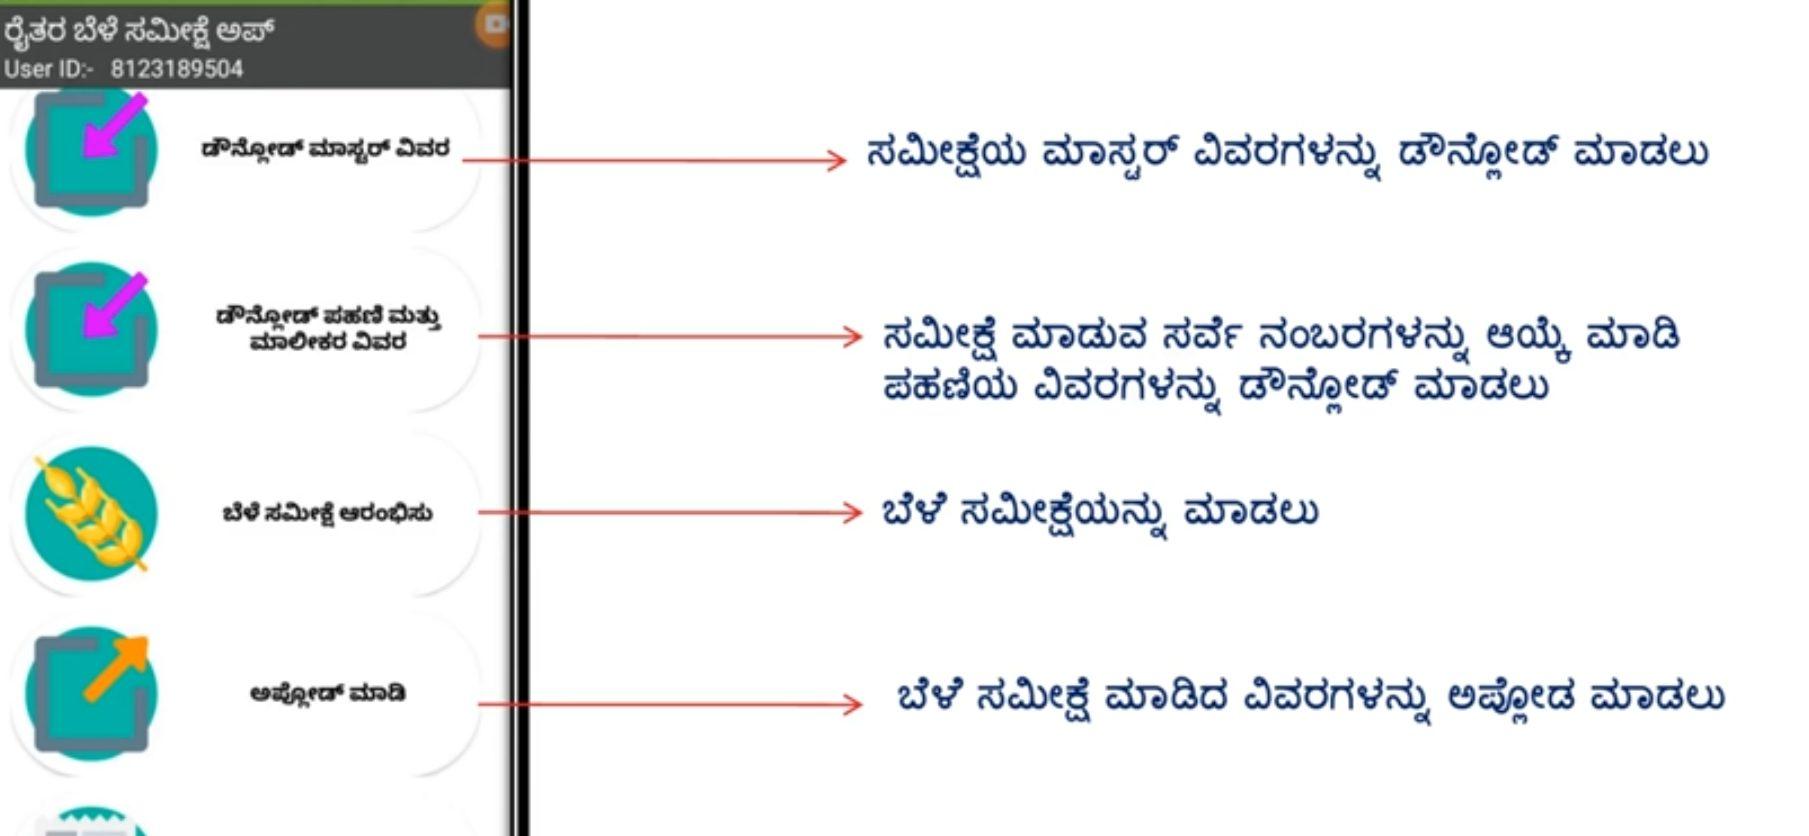 crop survey government of karnataka 2020, crop survey karnataka crop survey 2020-21, crop survey app crop survey 2021, crop survey government of karnataka 2020, crop survey 2020 kannada, how to use crop survey app,how to, download, Kannada tech,